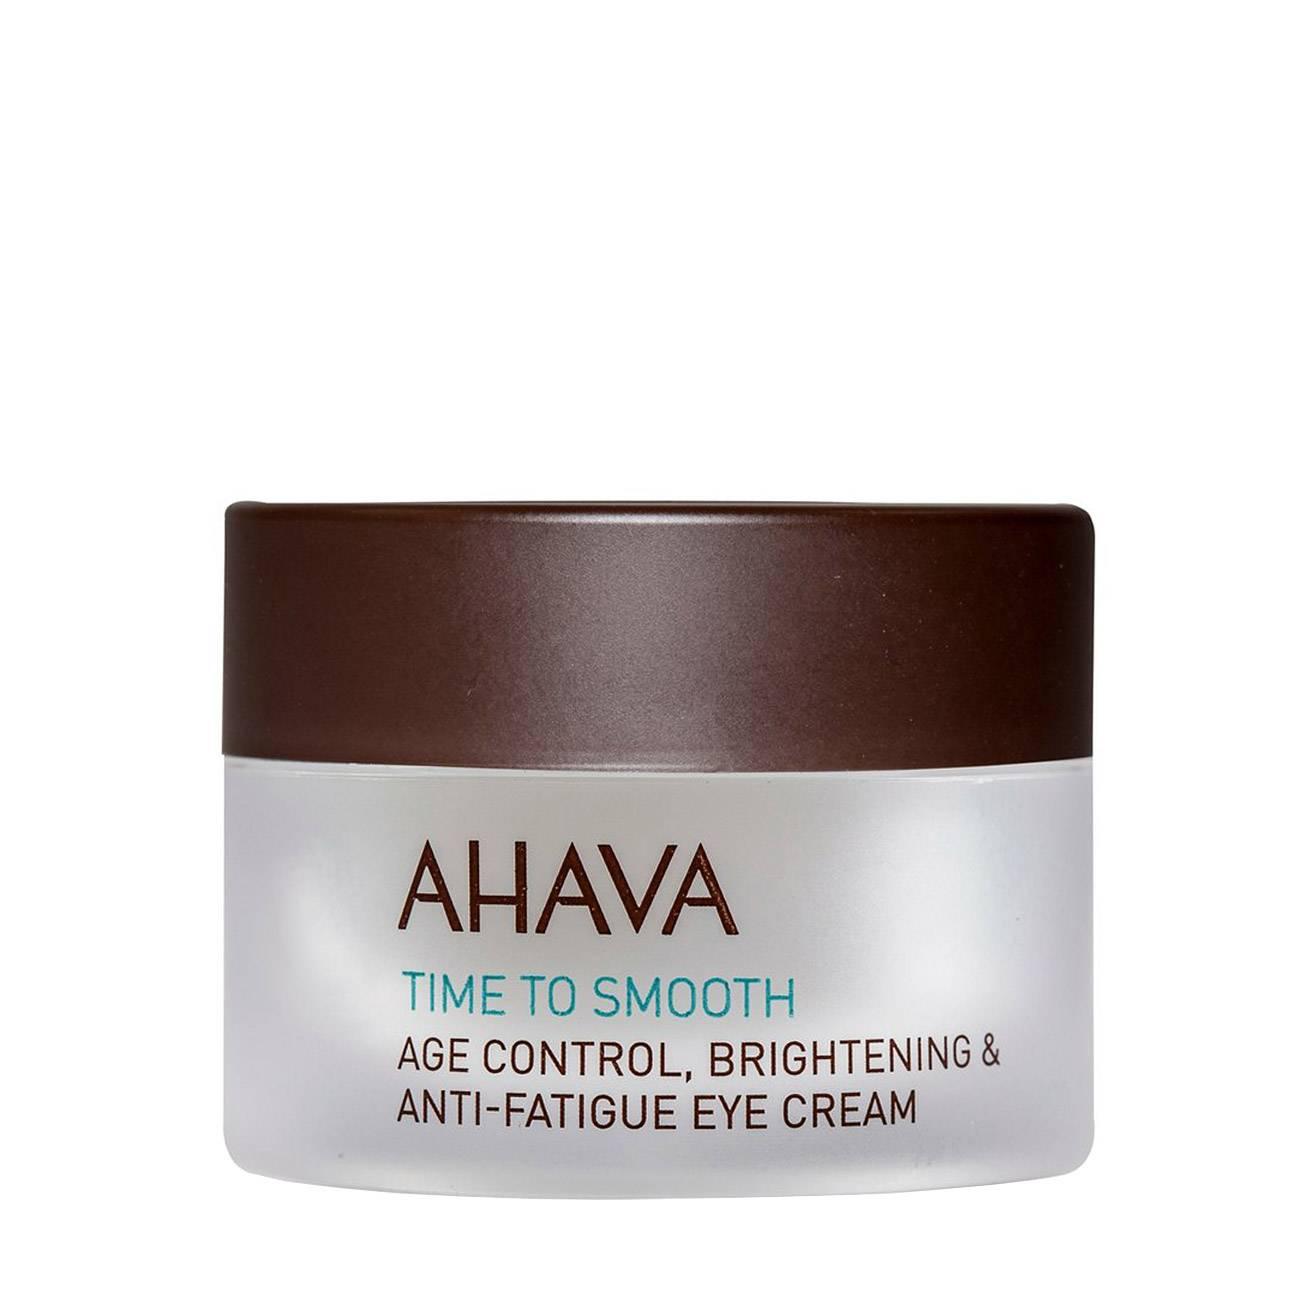 Time To Smooth Age Control Brightening & Anti-Fatigue 15 Ml Ahava imagine 2021 bestvalue.eu